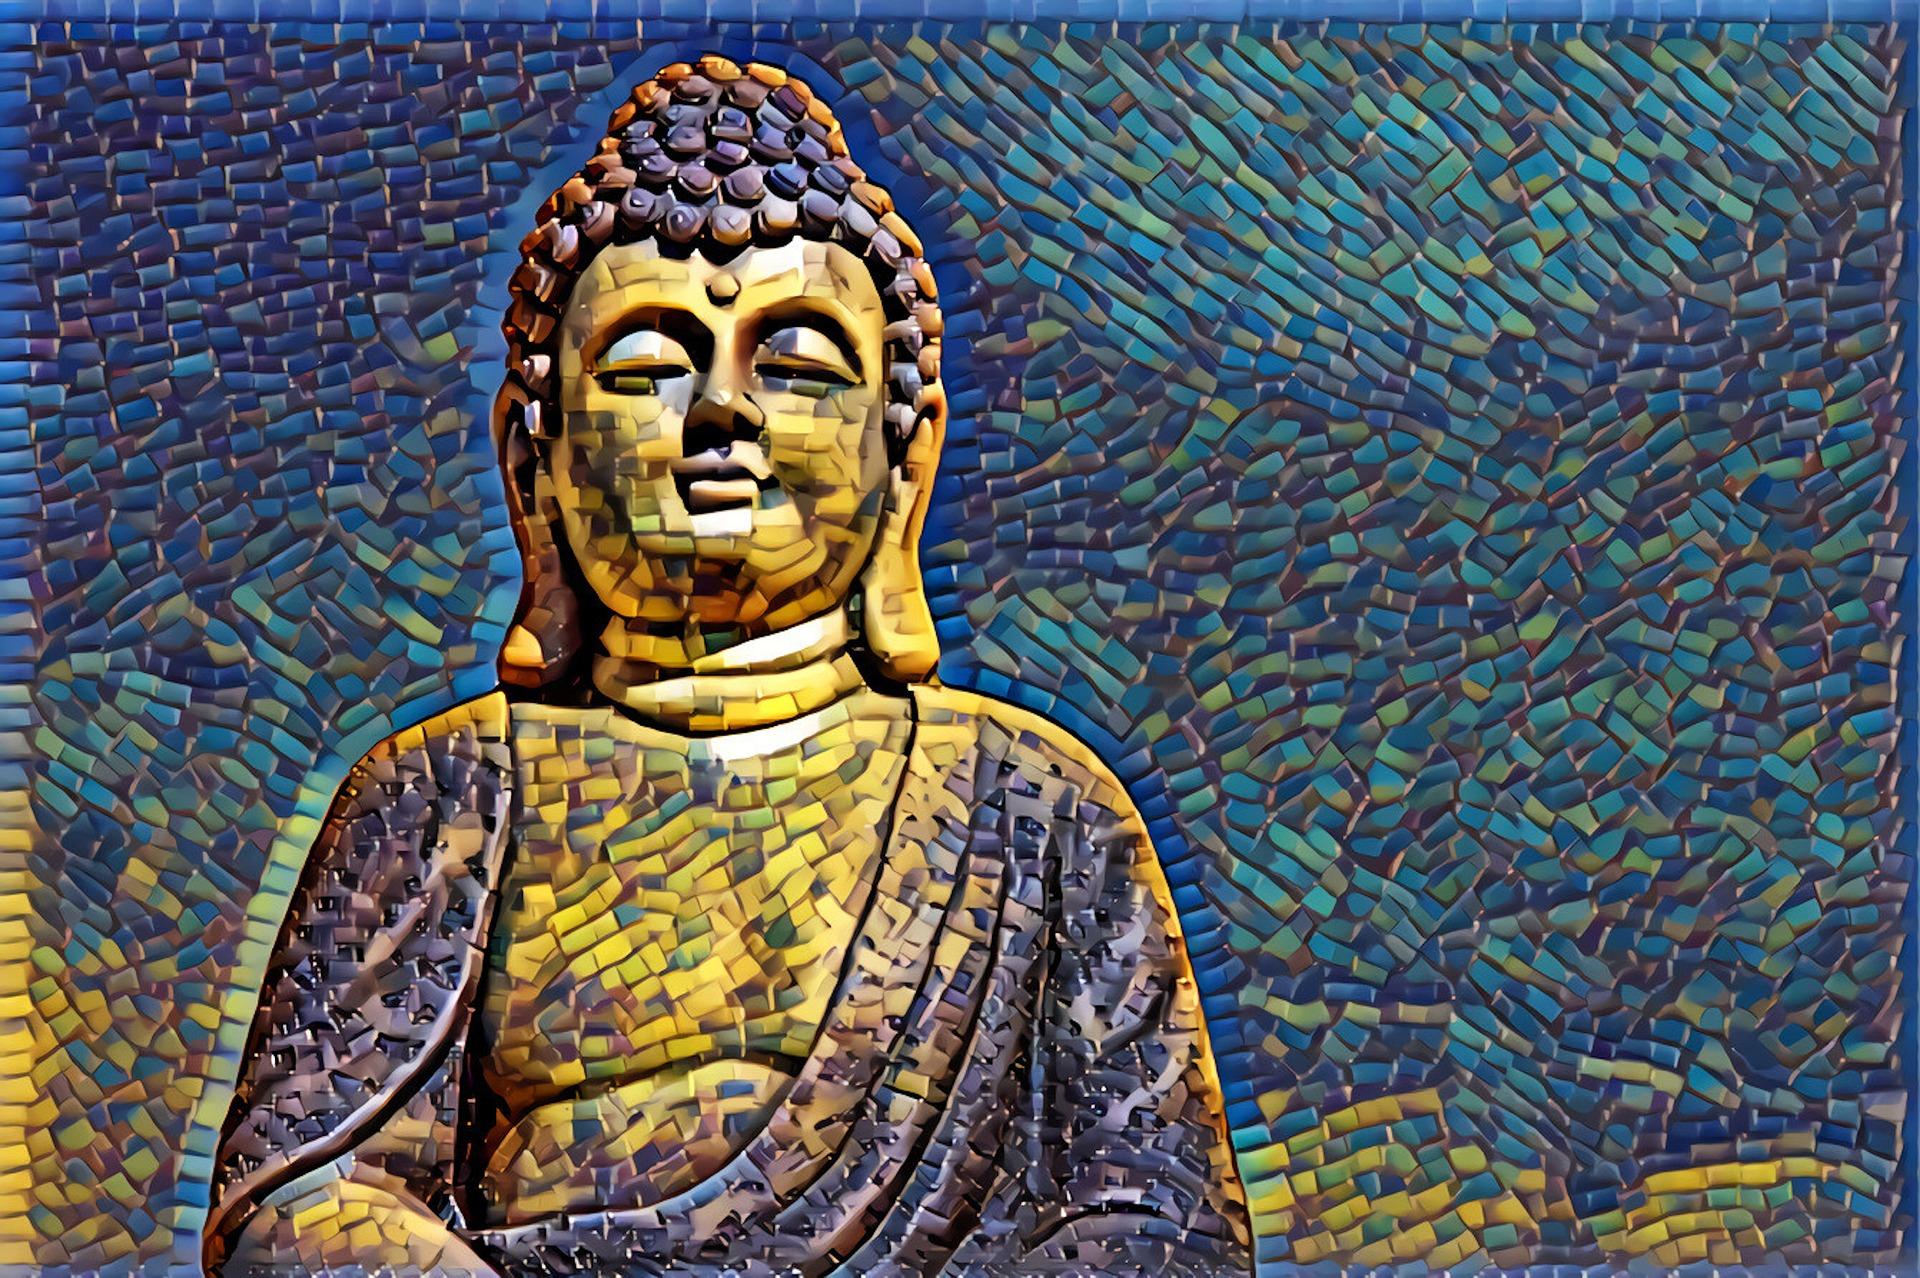 buddha-4125680_1920.jpg